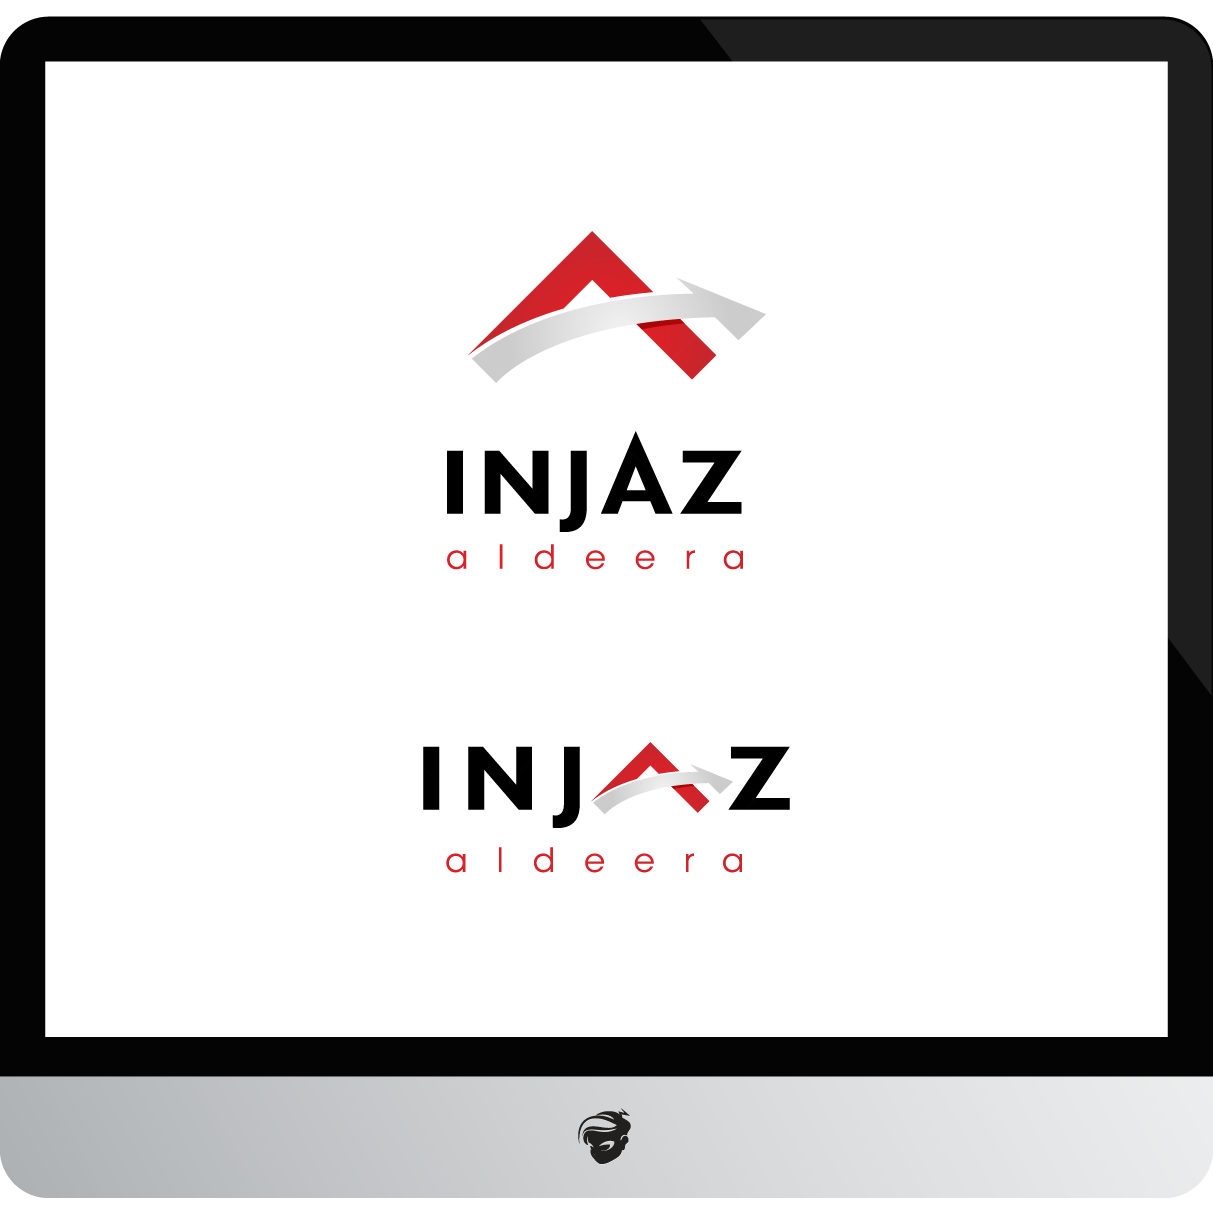 Logo Design by zesthar - Entry No. 66 in the Logo Design Contest Fun Logo Design for Injaz aldeera.